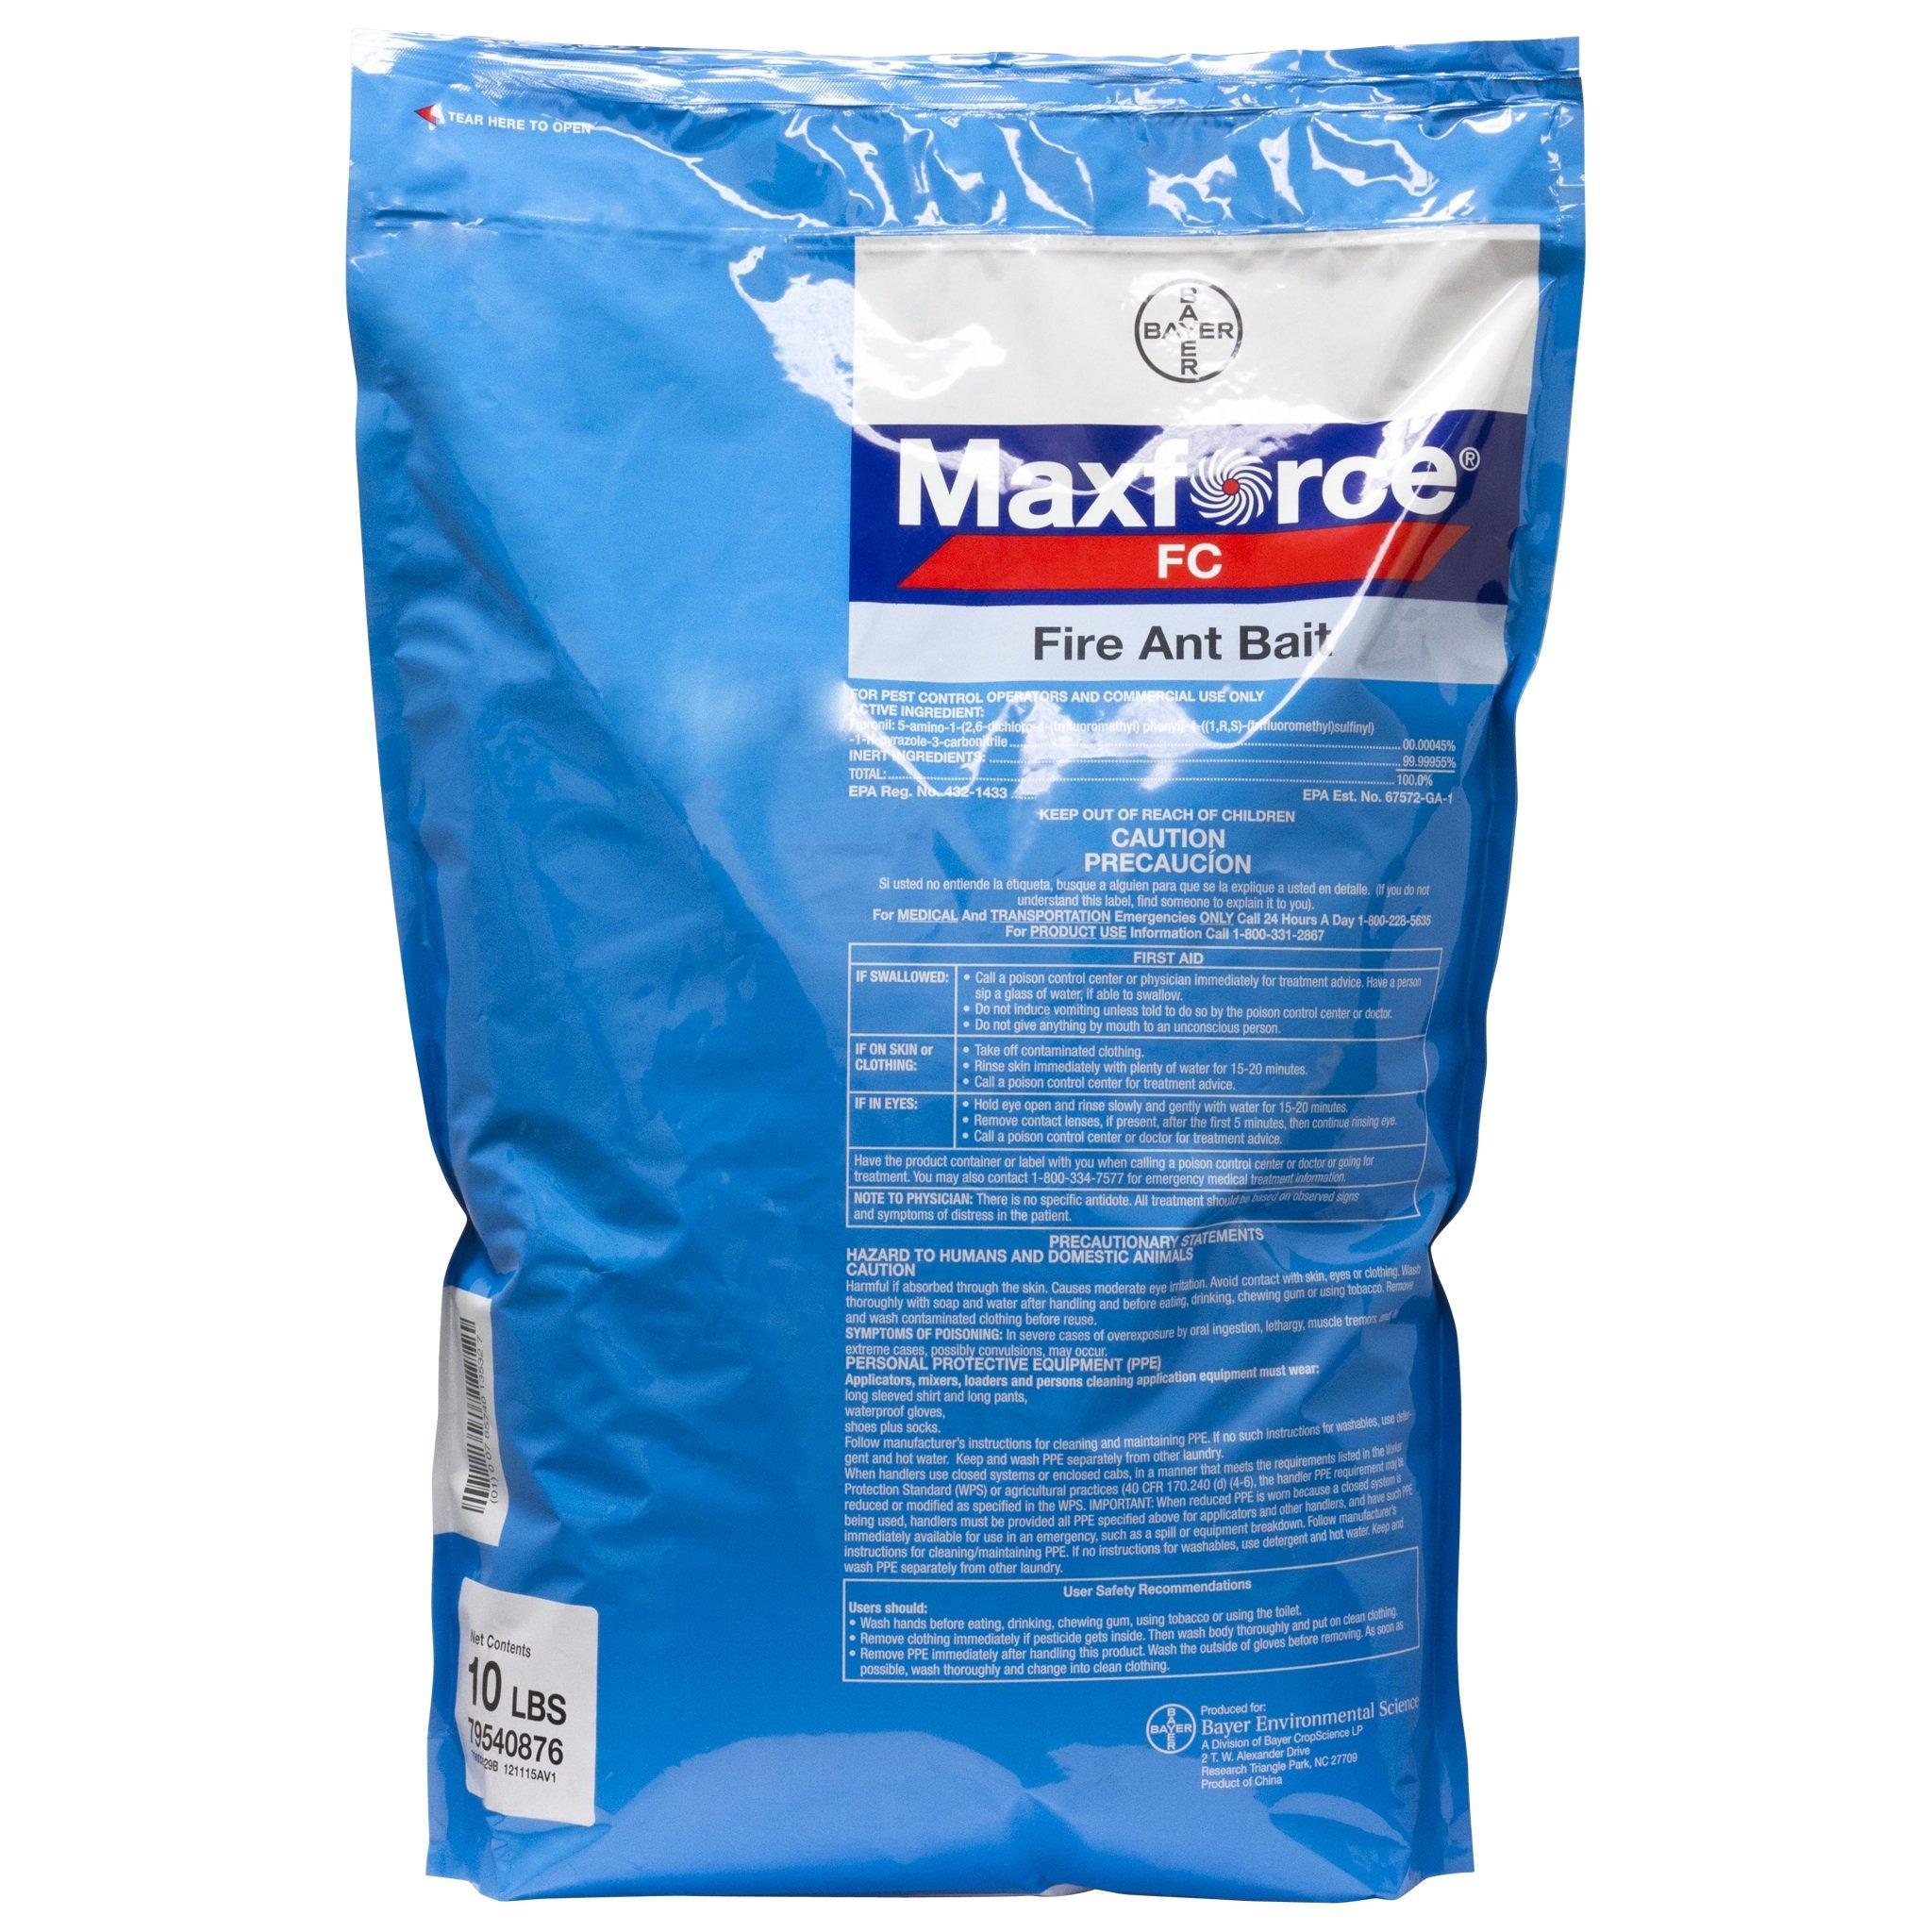 Maxforce FC Fire Ant Bait Killer 10 lbs BA1028 by Bayer